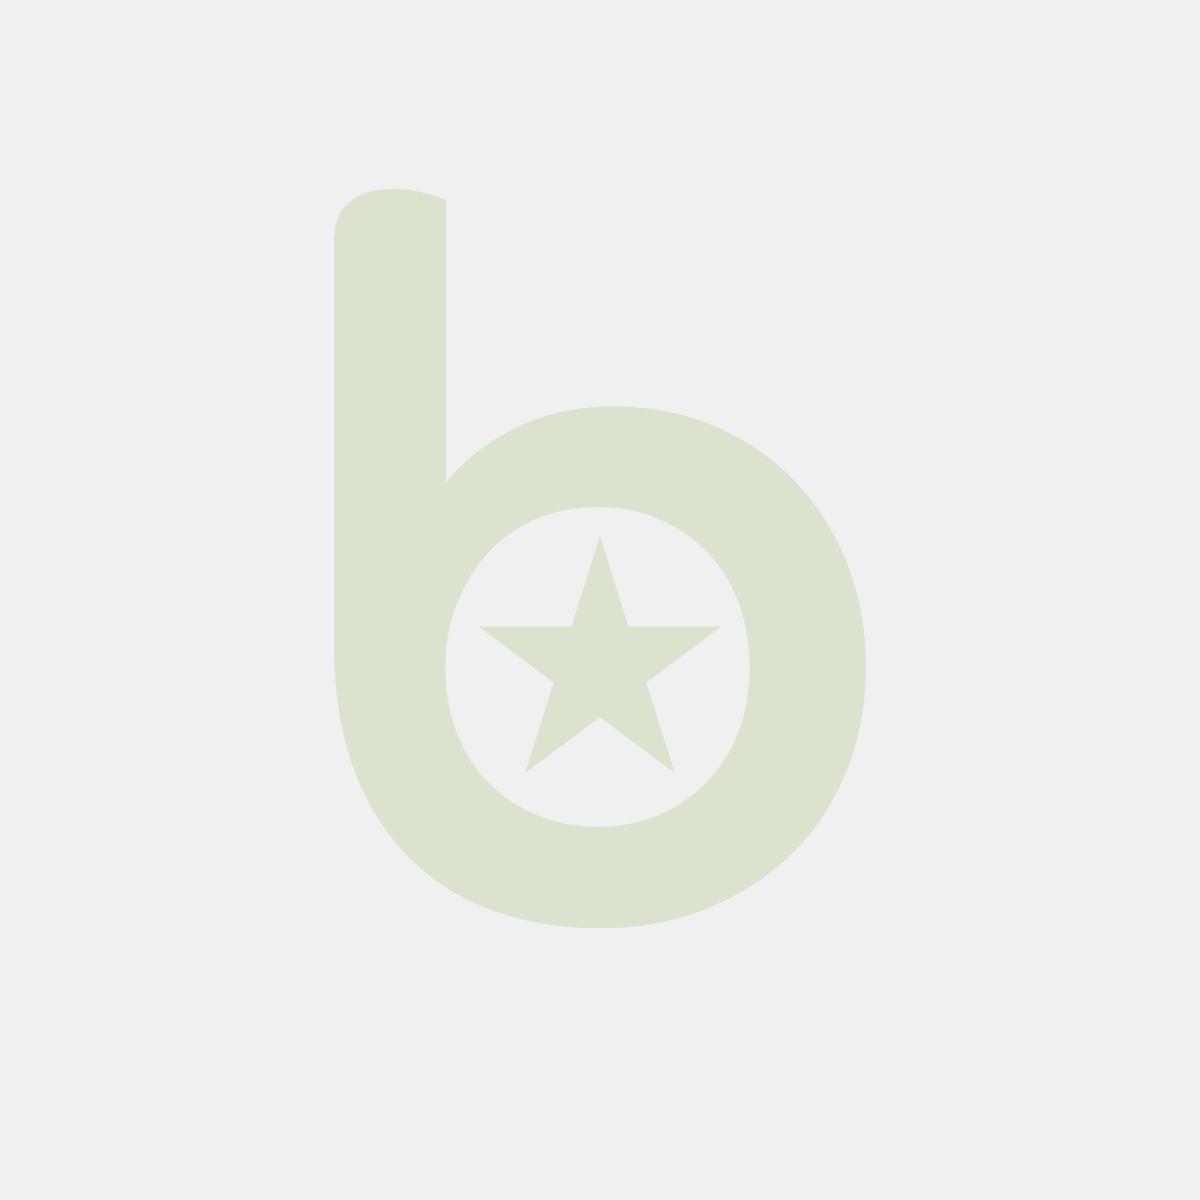 FINGERFOOD - taca cateringowa PS transparentna 37x27,1xh.2,1cm op. 6 sztuk